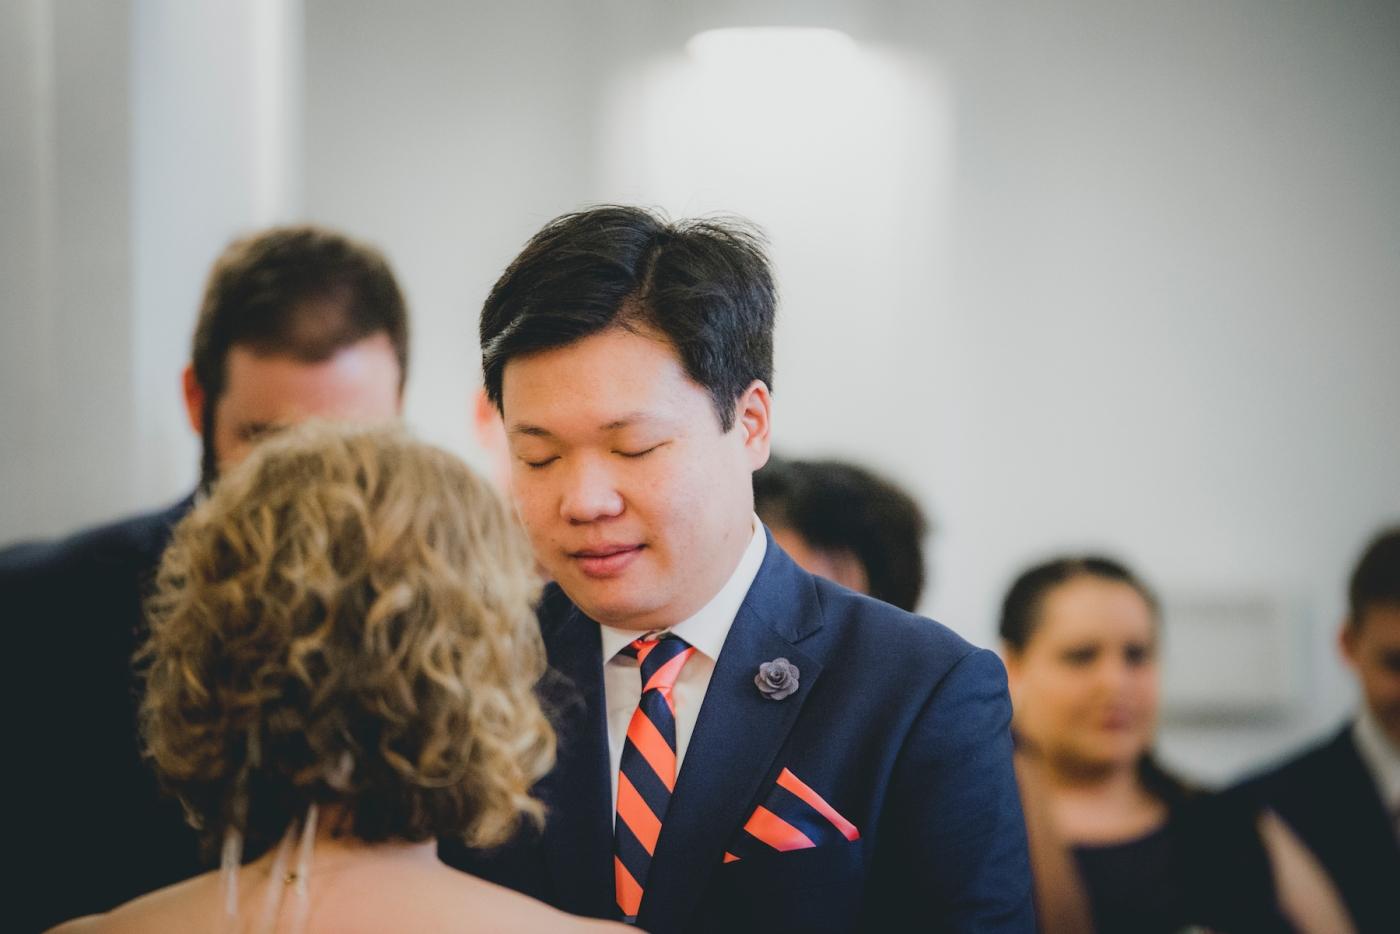 DSC_2584Everett_Wedding_Ballroom_Jane_Speleers_photography_Rachel_and_Edmund_Ceremony_2017